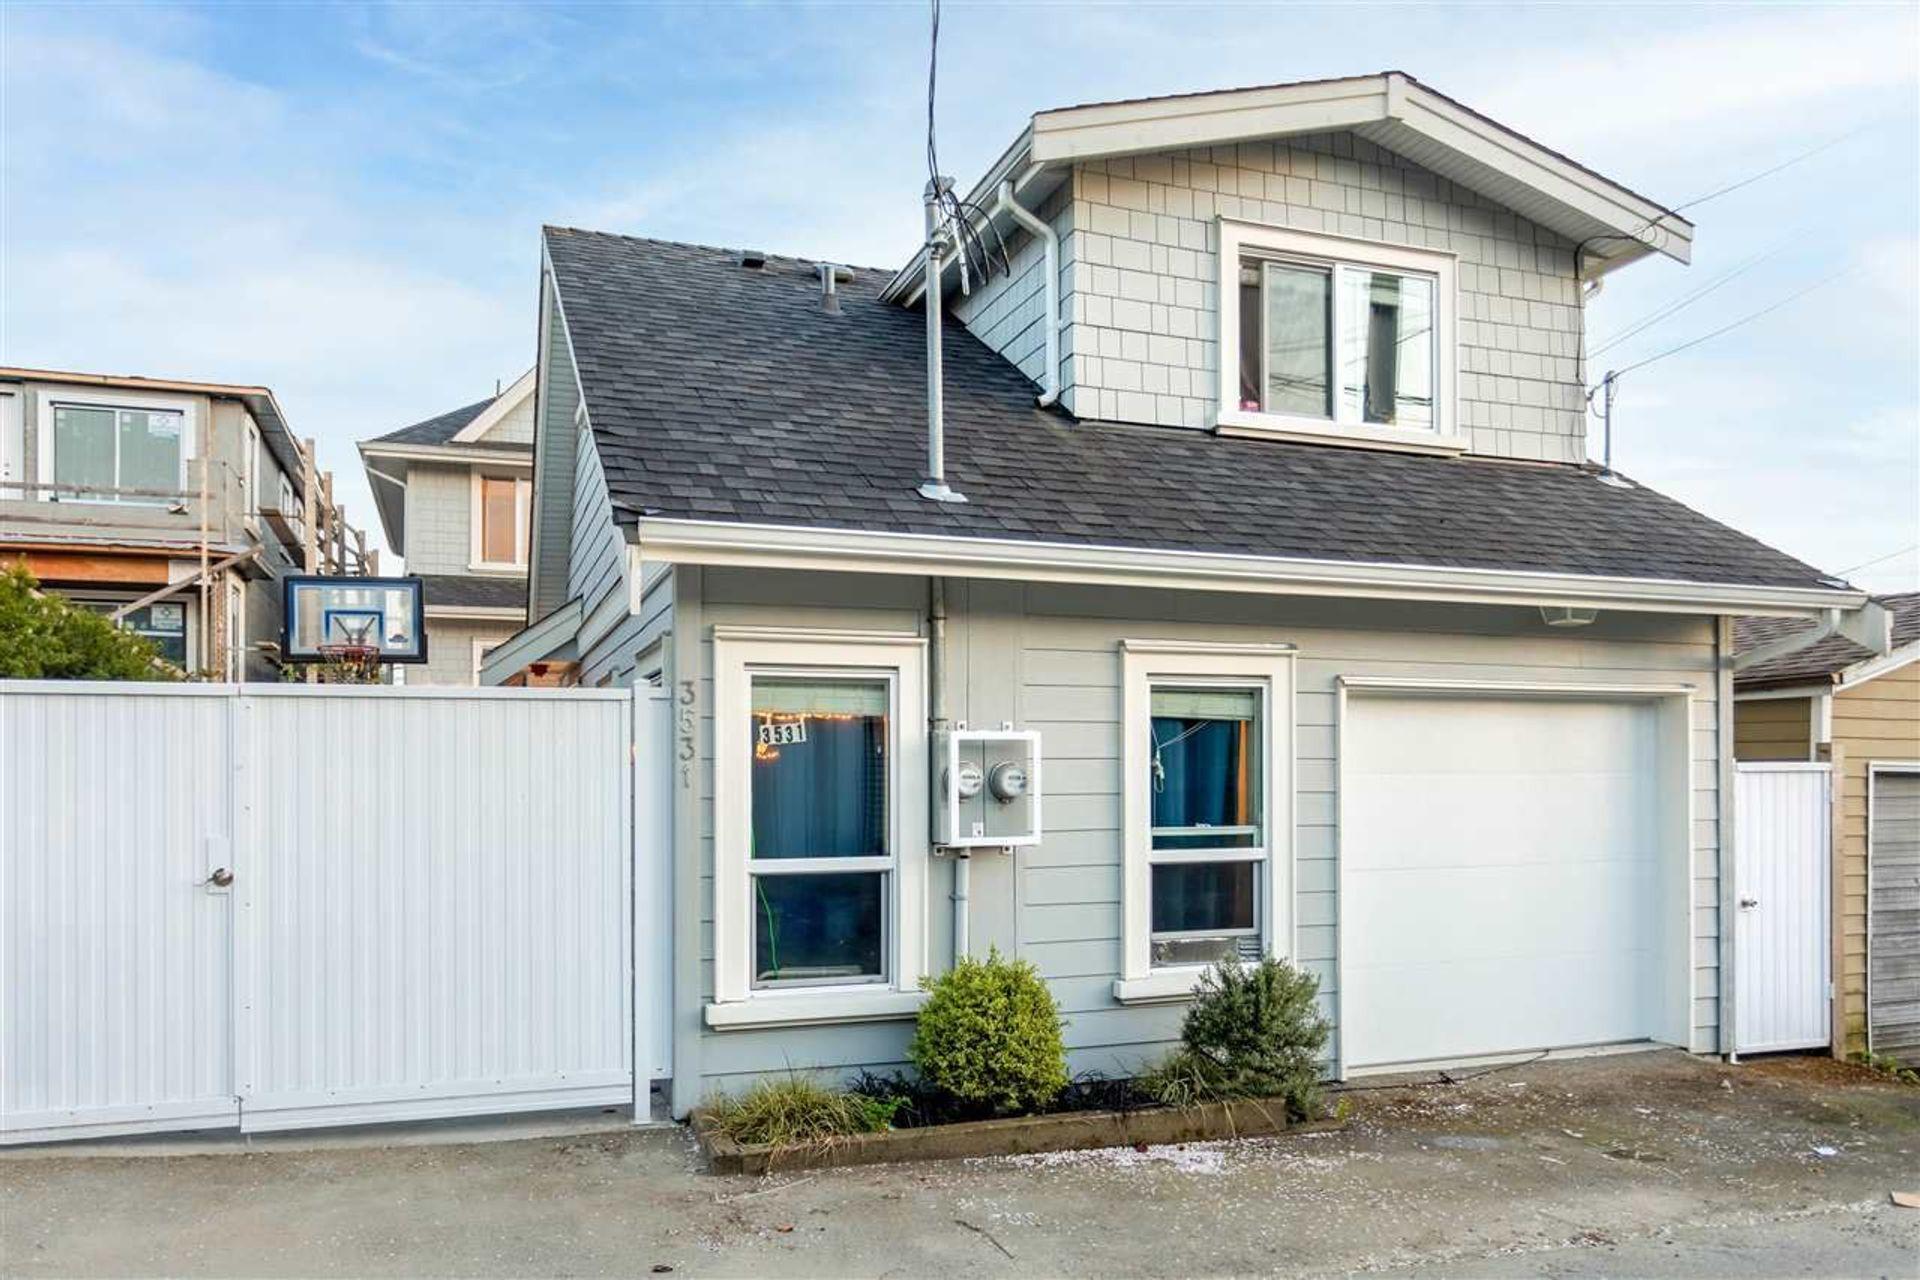 3535-dundas-street-hastings-sunrise-vancouver-east-37 at 3535 Dundas Street, Hastings Sunrise, Vancouver East